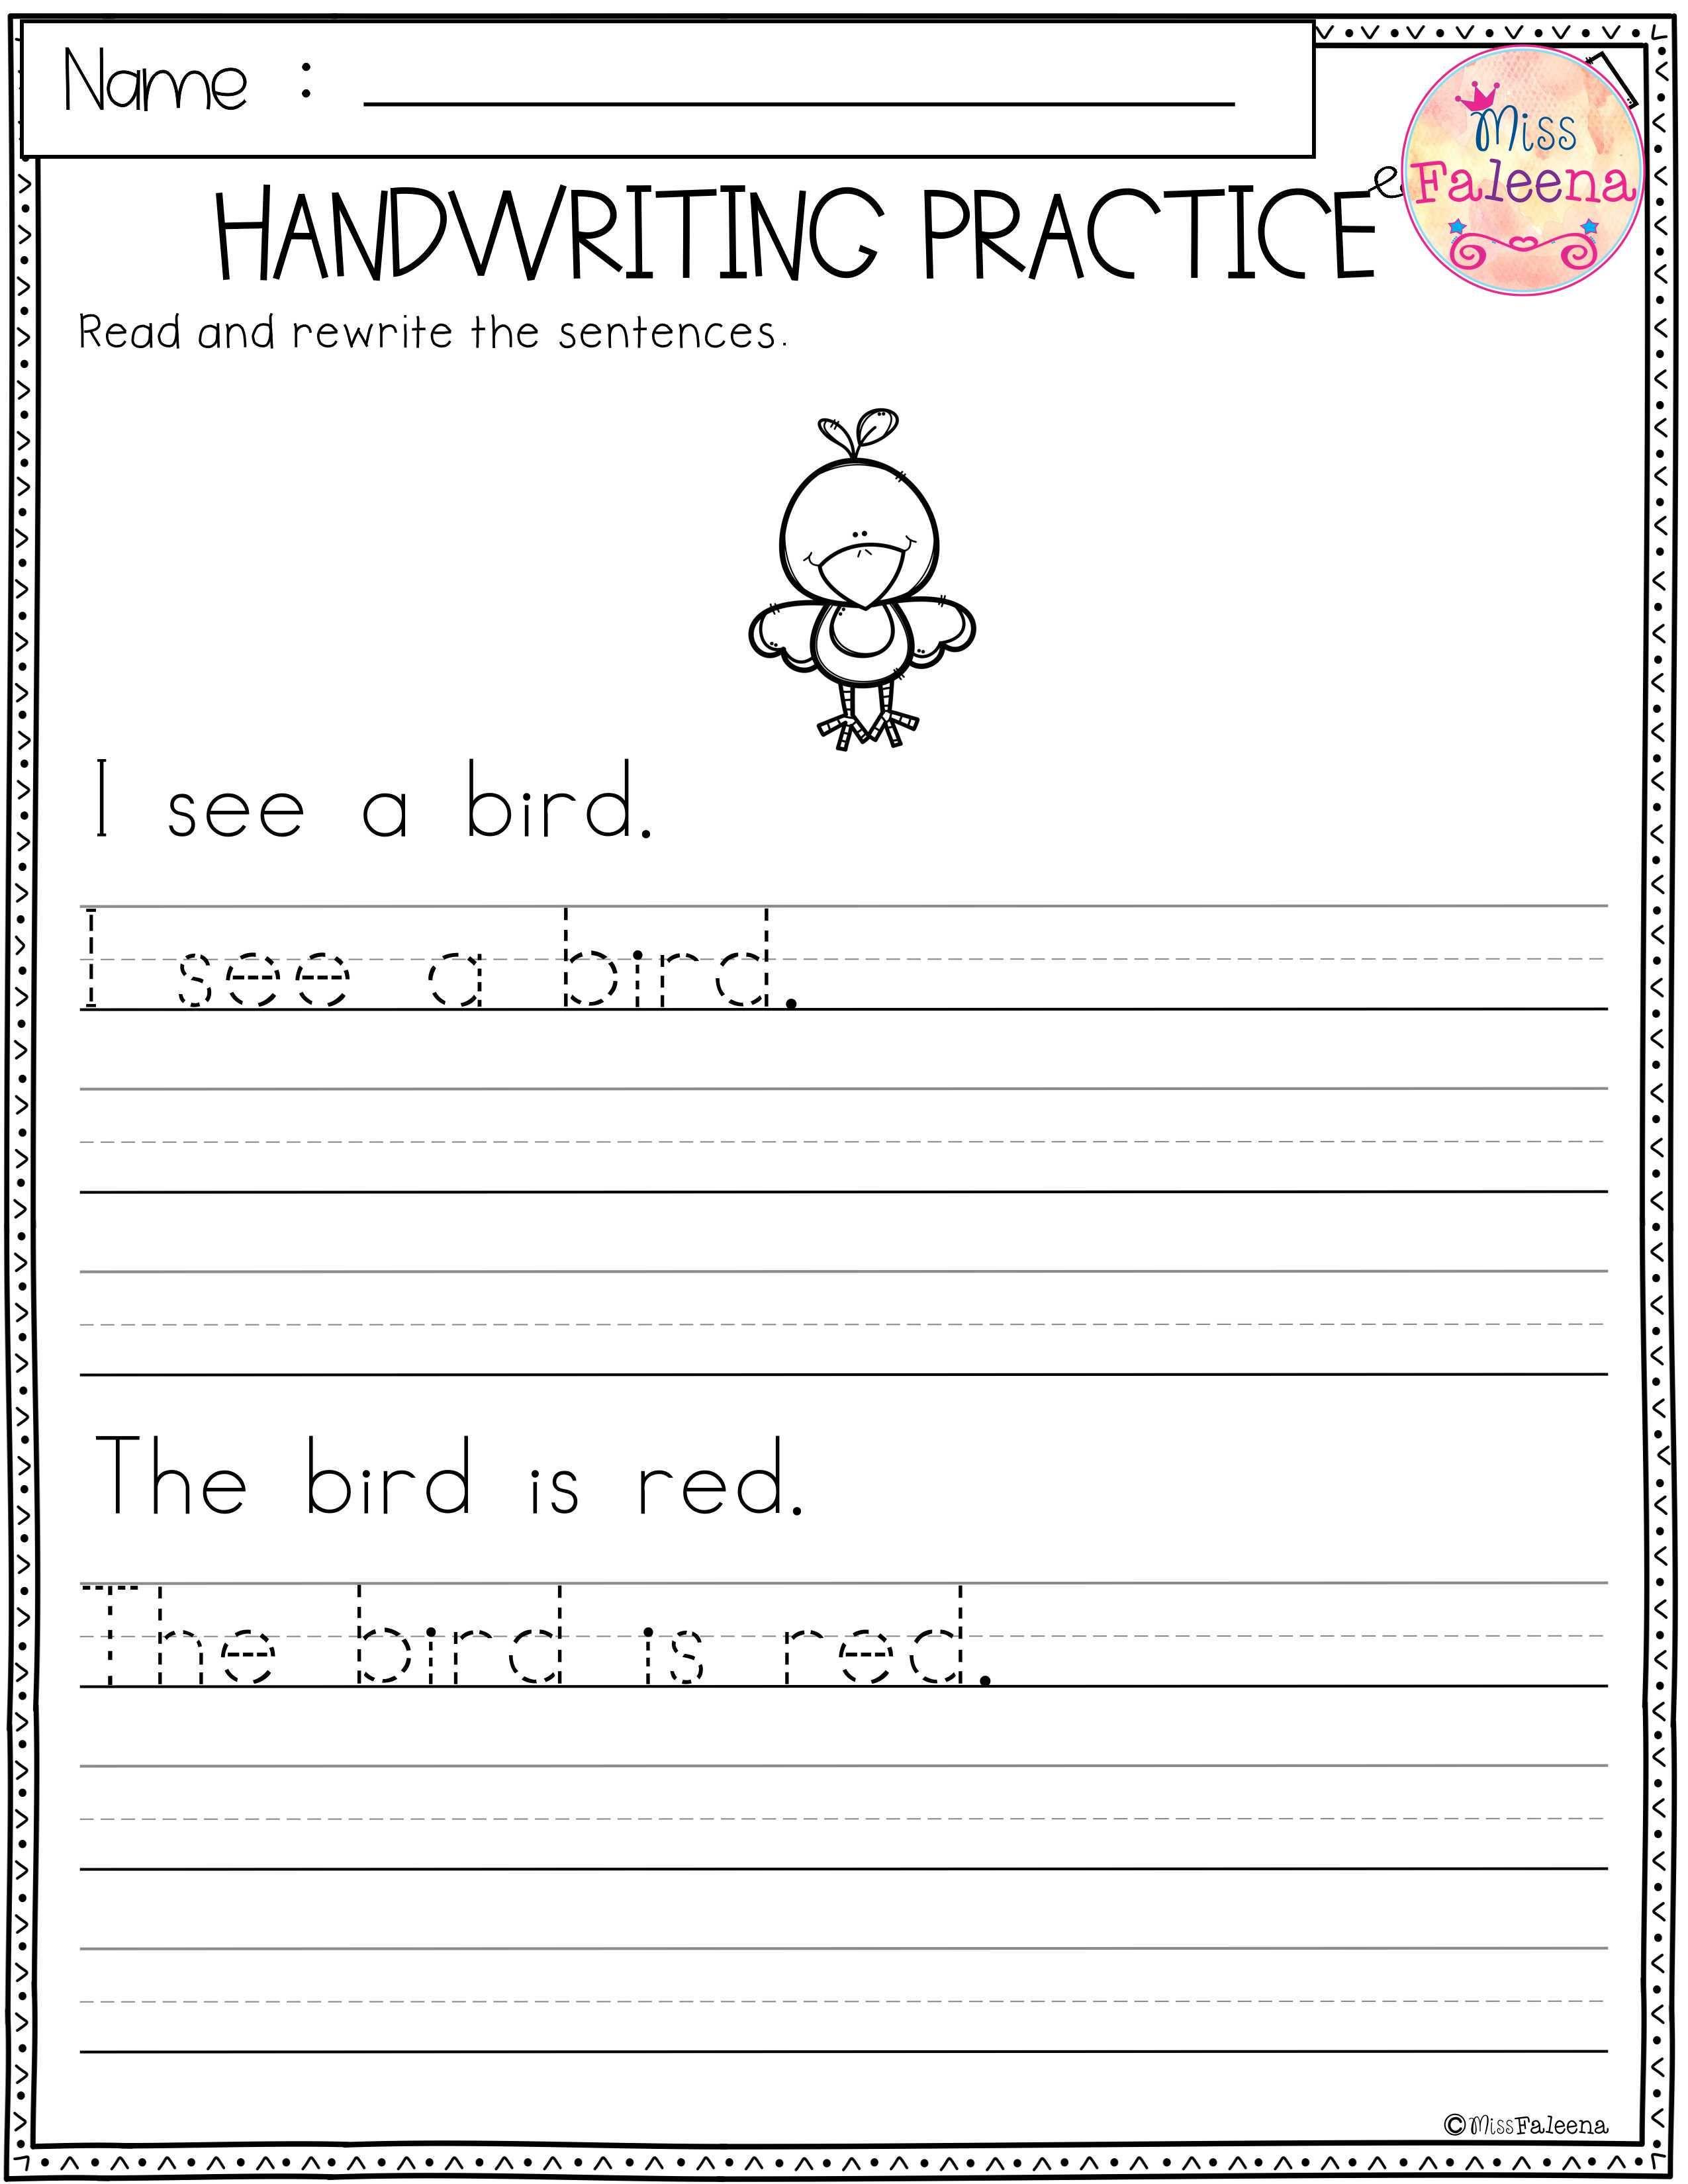 Free Handwriting Practice Writing Practice Worksheets Handwriting Practice Kindergarten Writing Practice